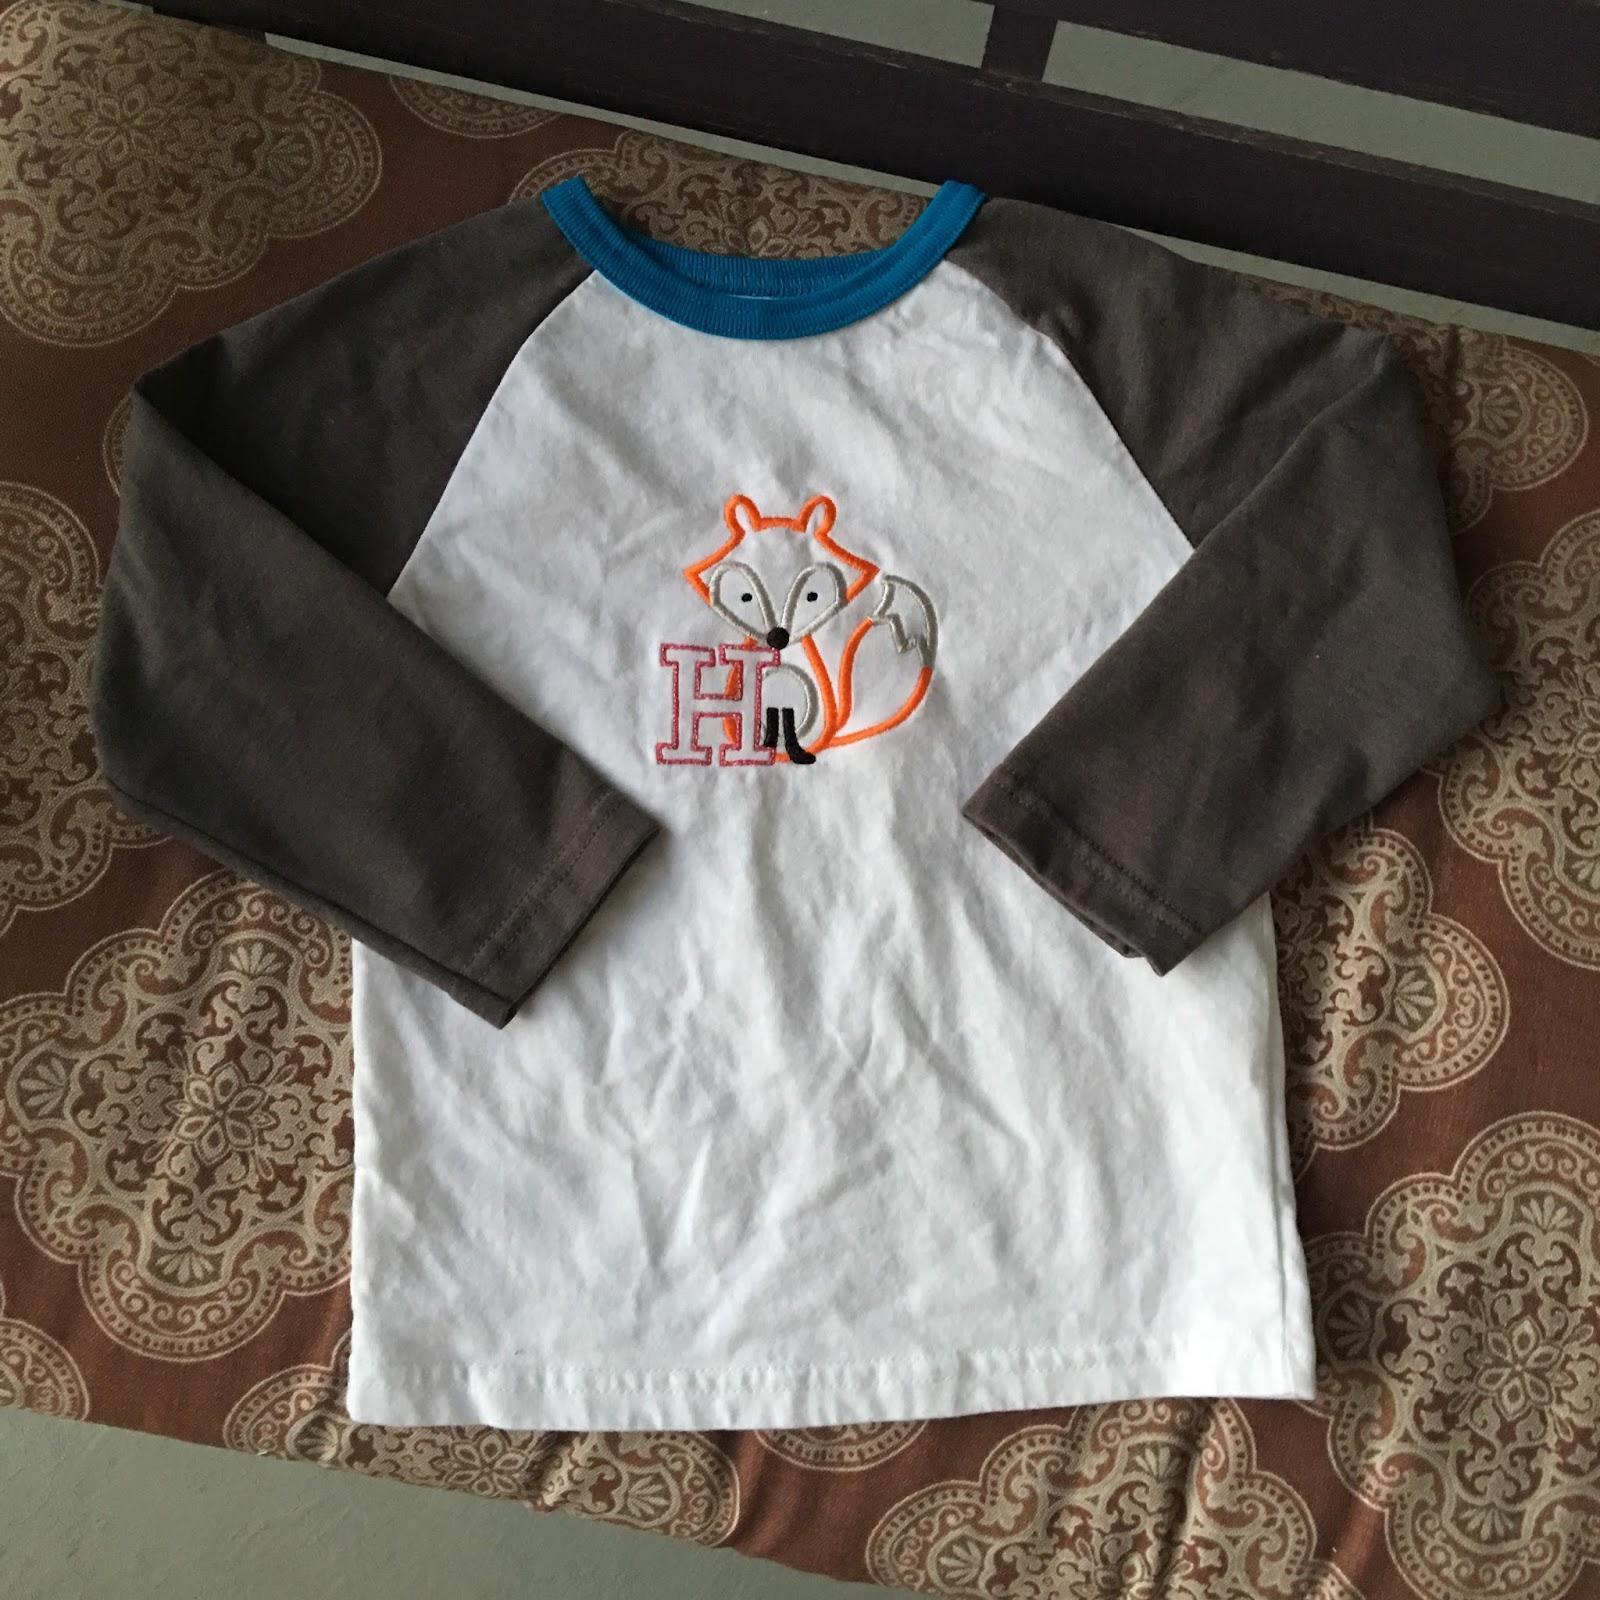 Marla, Plain and Small: Embroidered Fox Raglan Tee